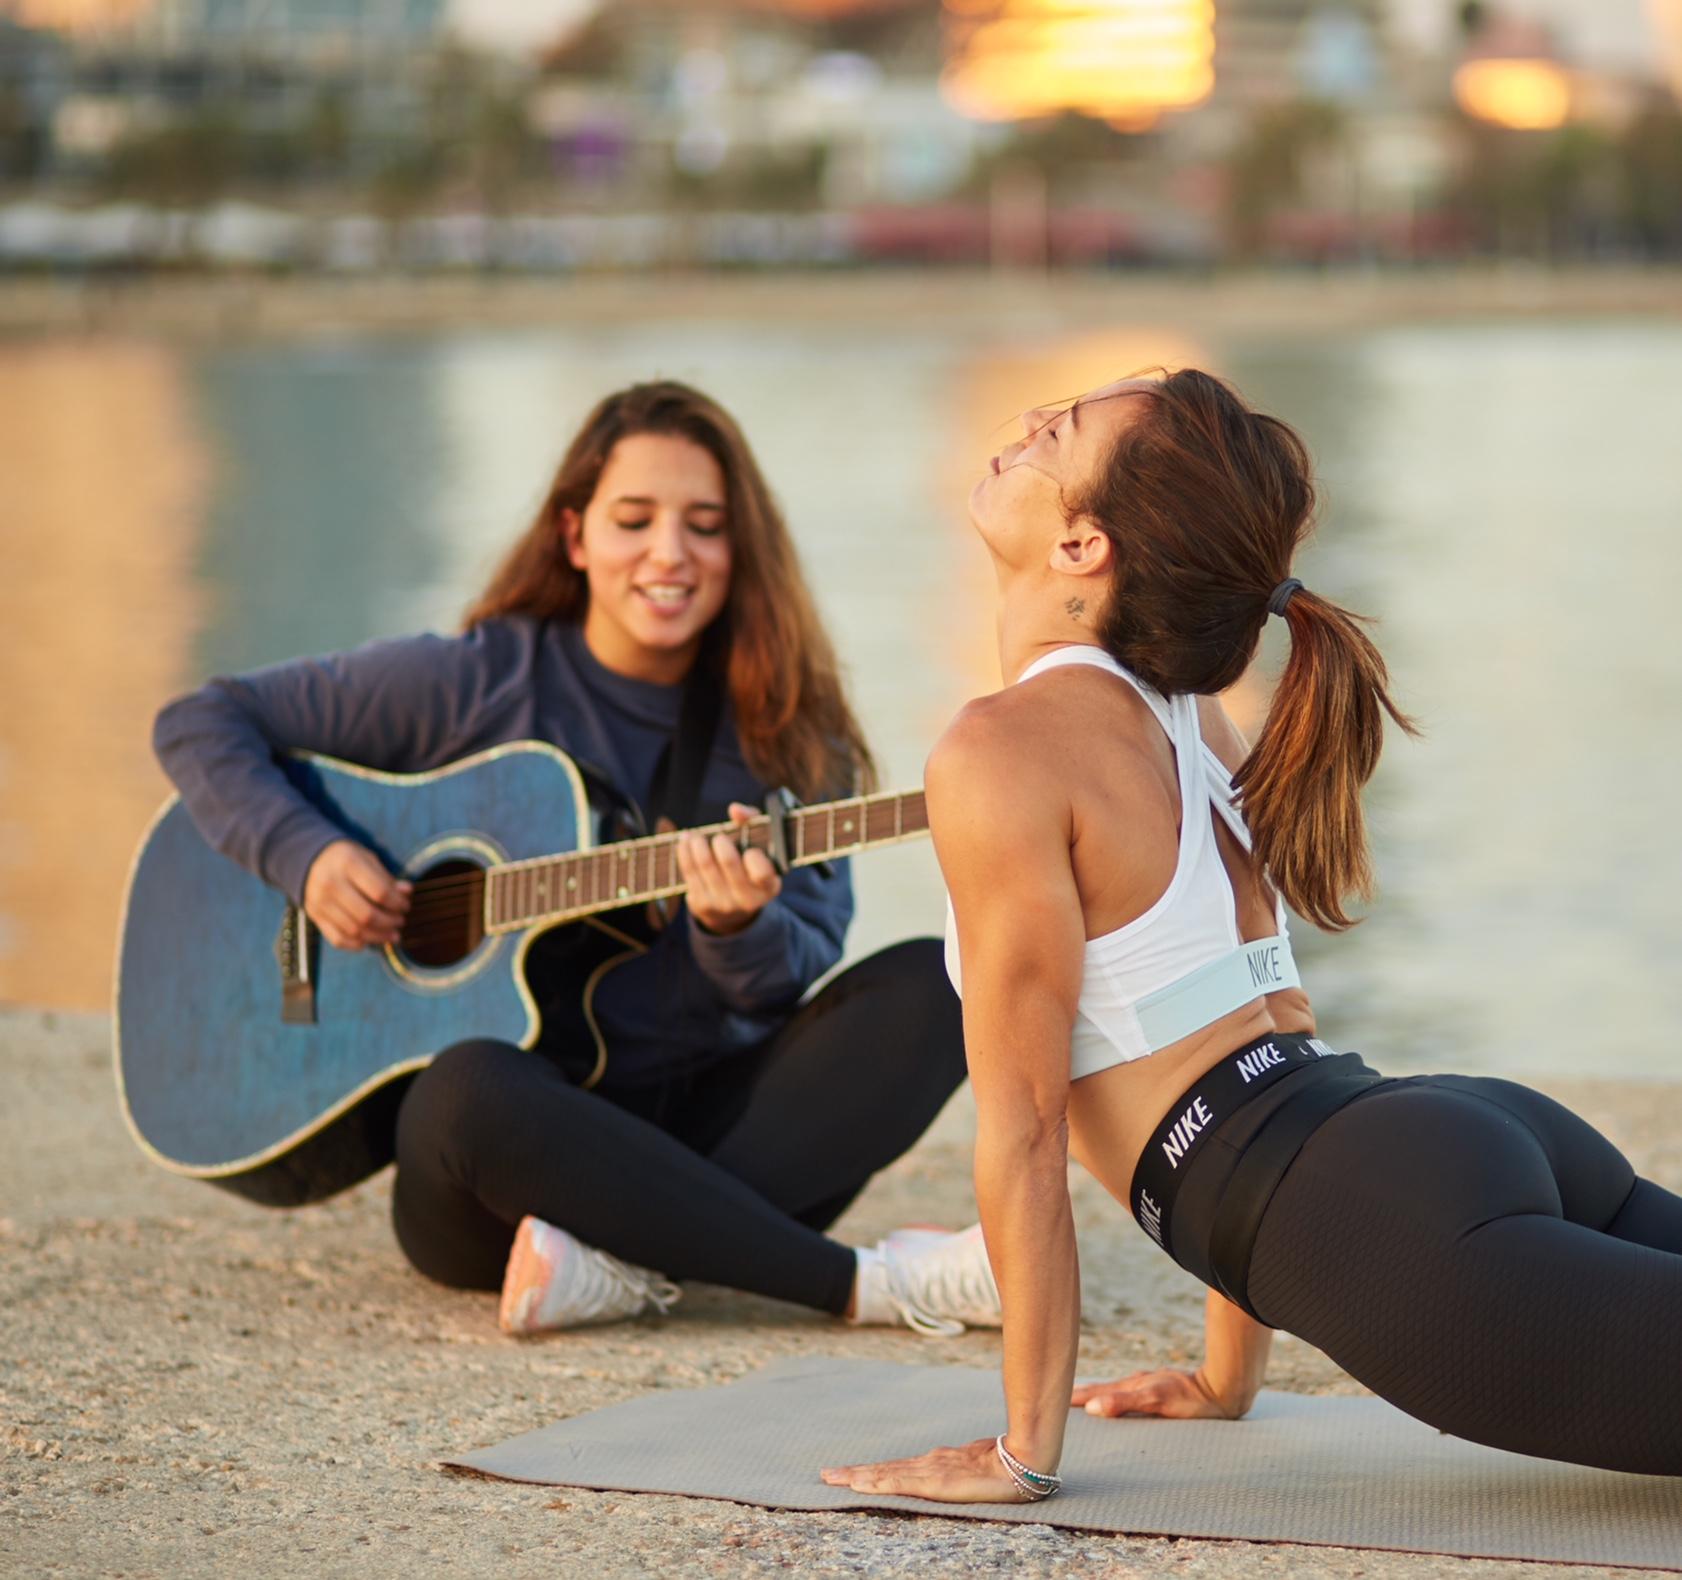 salud inspira fitness barcelona paula butragueño inspirafit